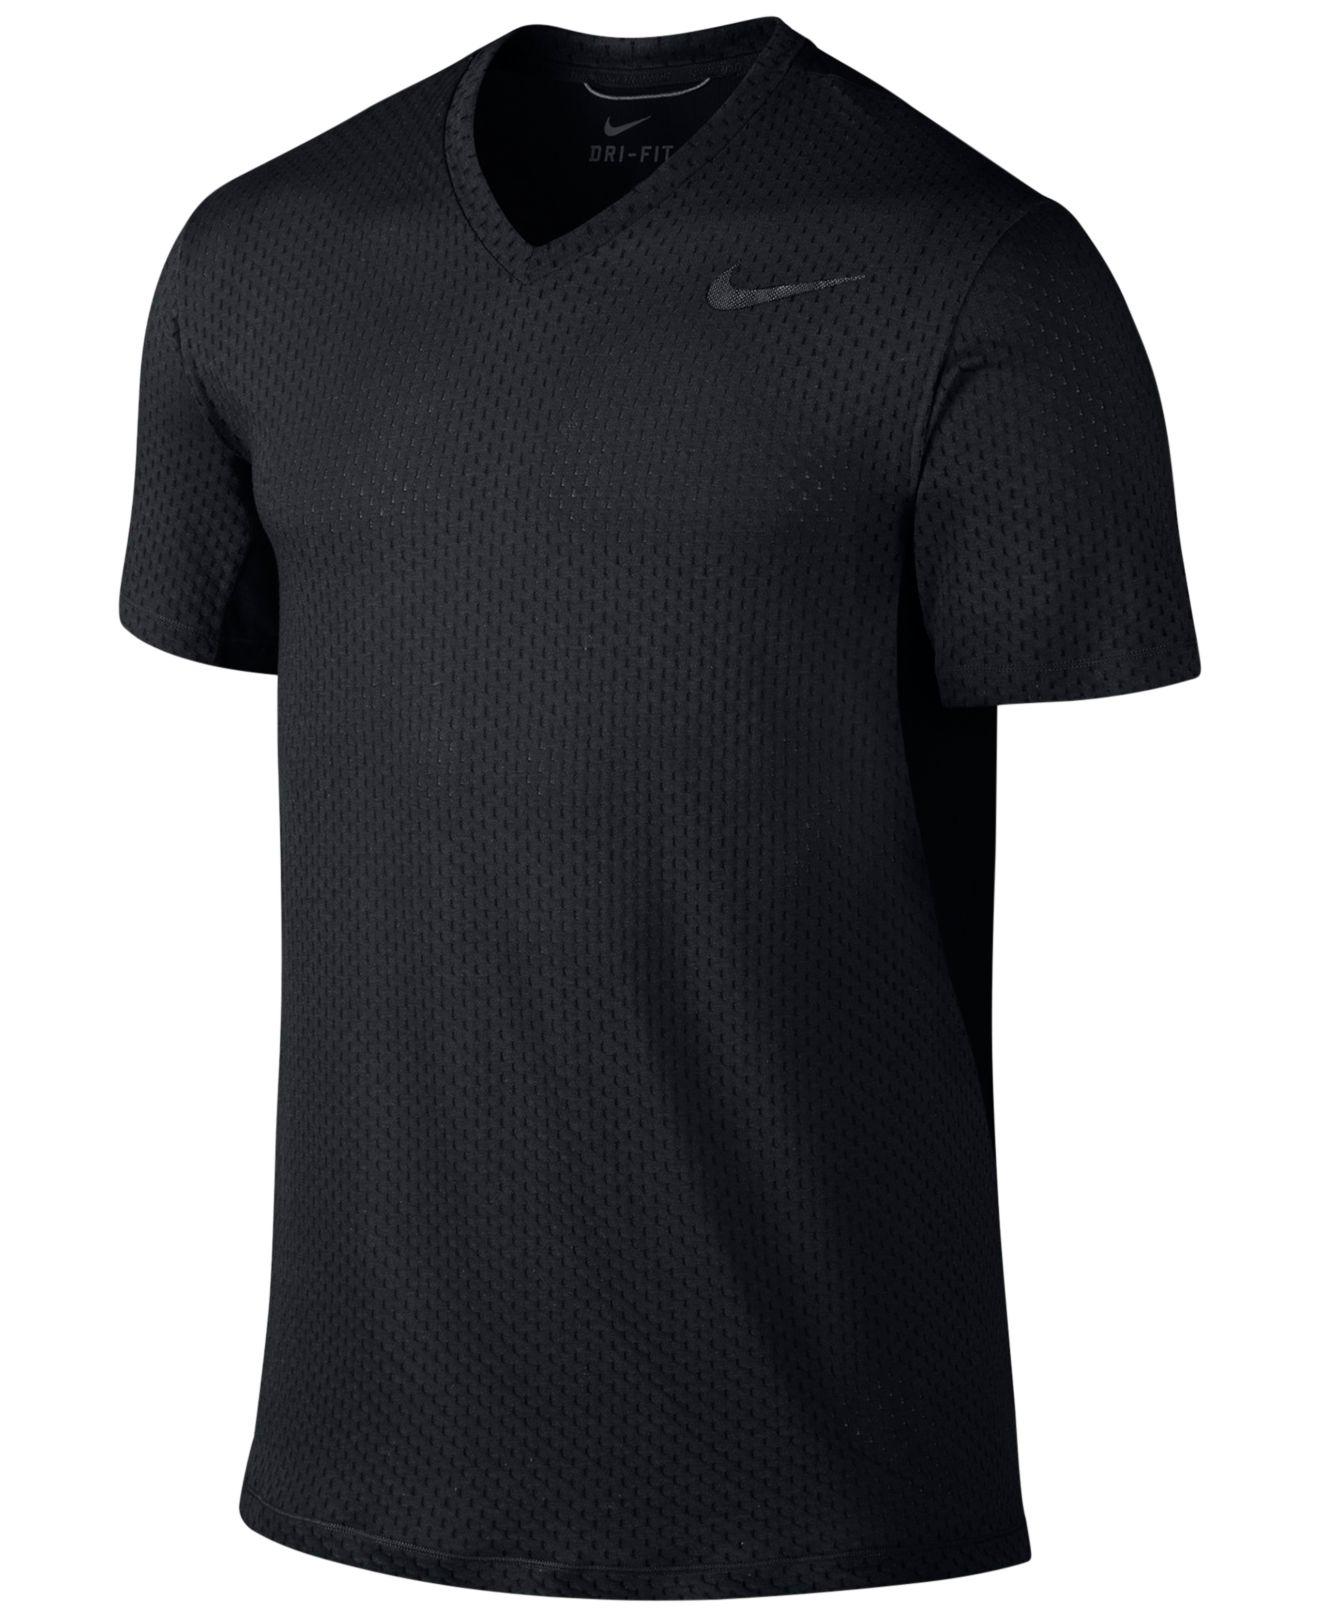 Lyst nike cool dri fit v neck training t shirt in black for Dri fit t shirt design